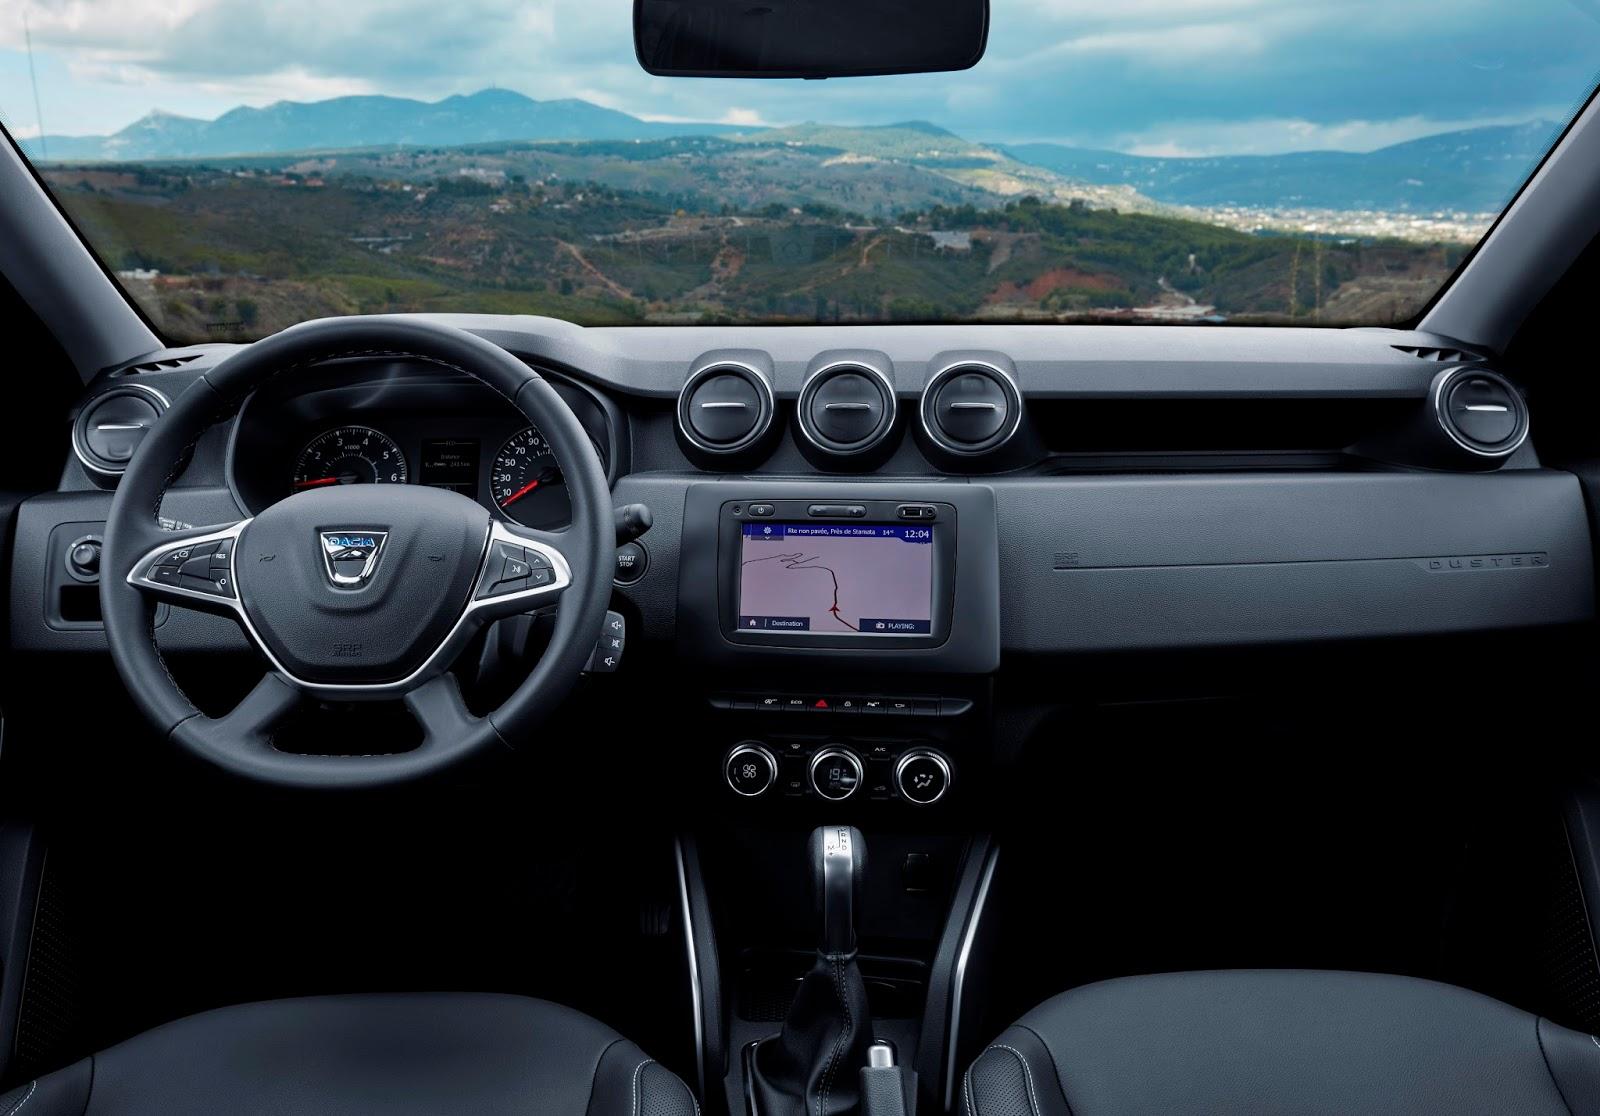 25CE259D25CE25AD25CE25BF2BDacia2BDUSTER2B252832529 Από 13.670 ευρώ το νέο Dacia Duster Dacia, Dacia Duster, zblog, αυτοκίνητα, καινούρια, τιμες